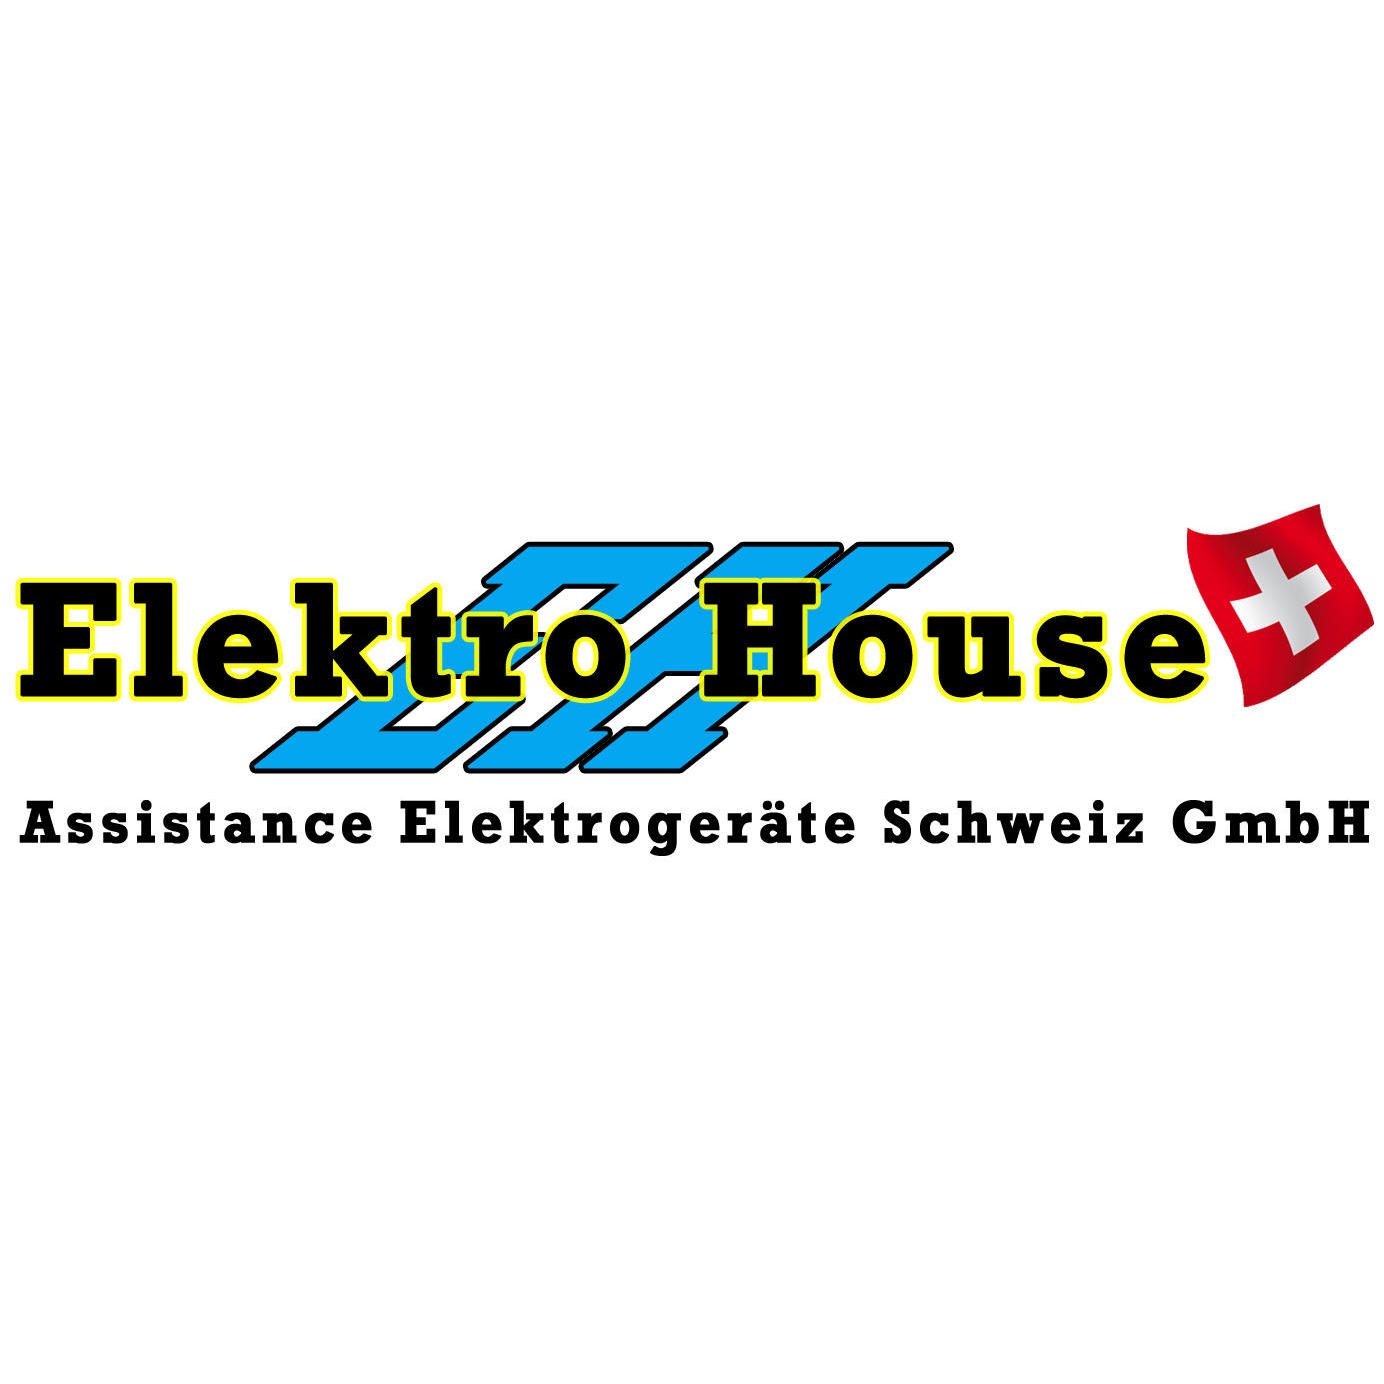 Assistance Elektrogeräte Schweiz GmbH